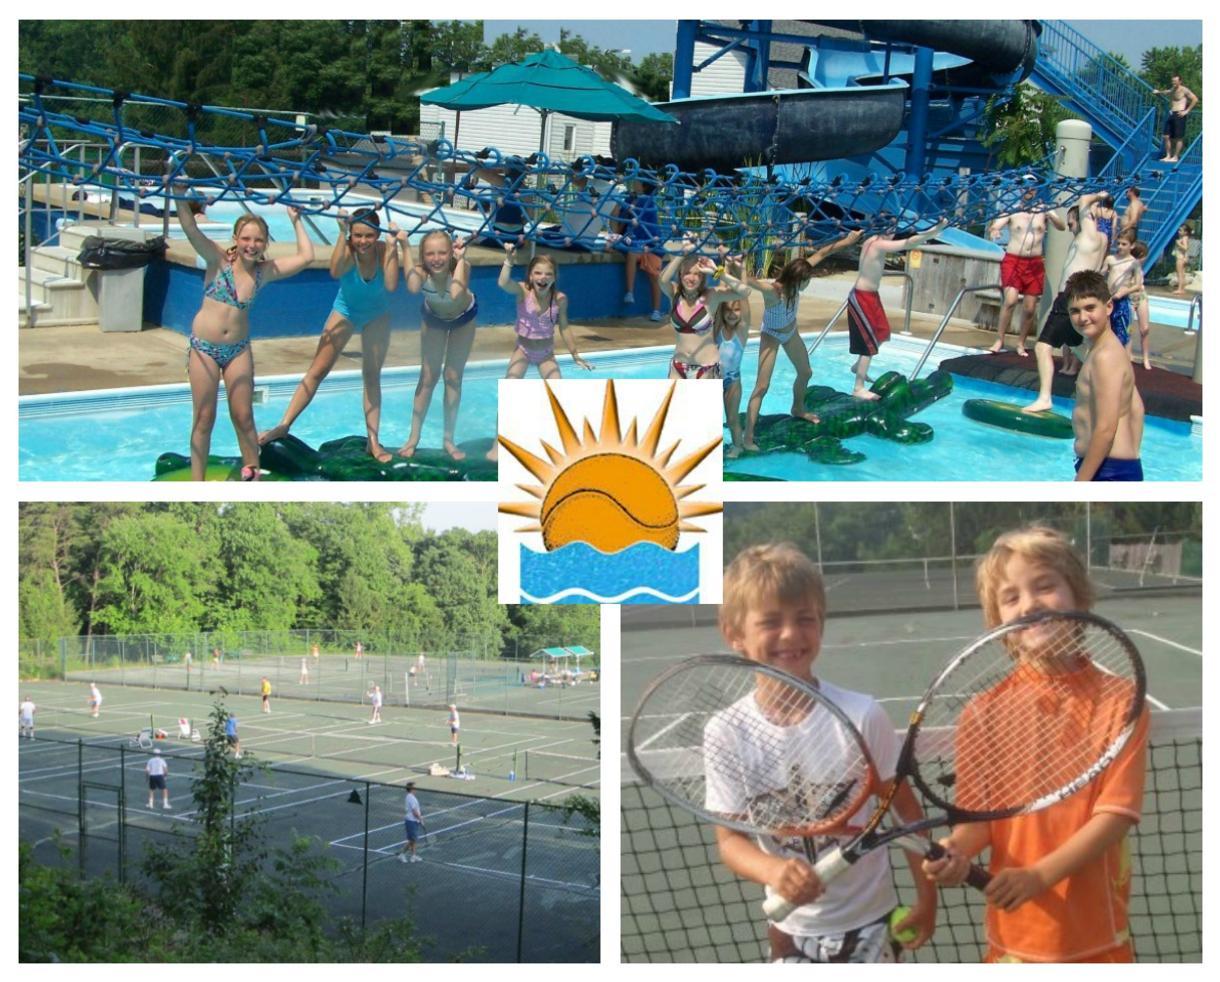 Weekday Full Club Family Membership - Pools, Racket Sports ...